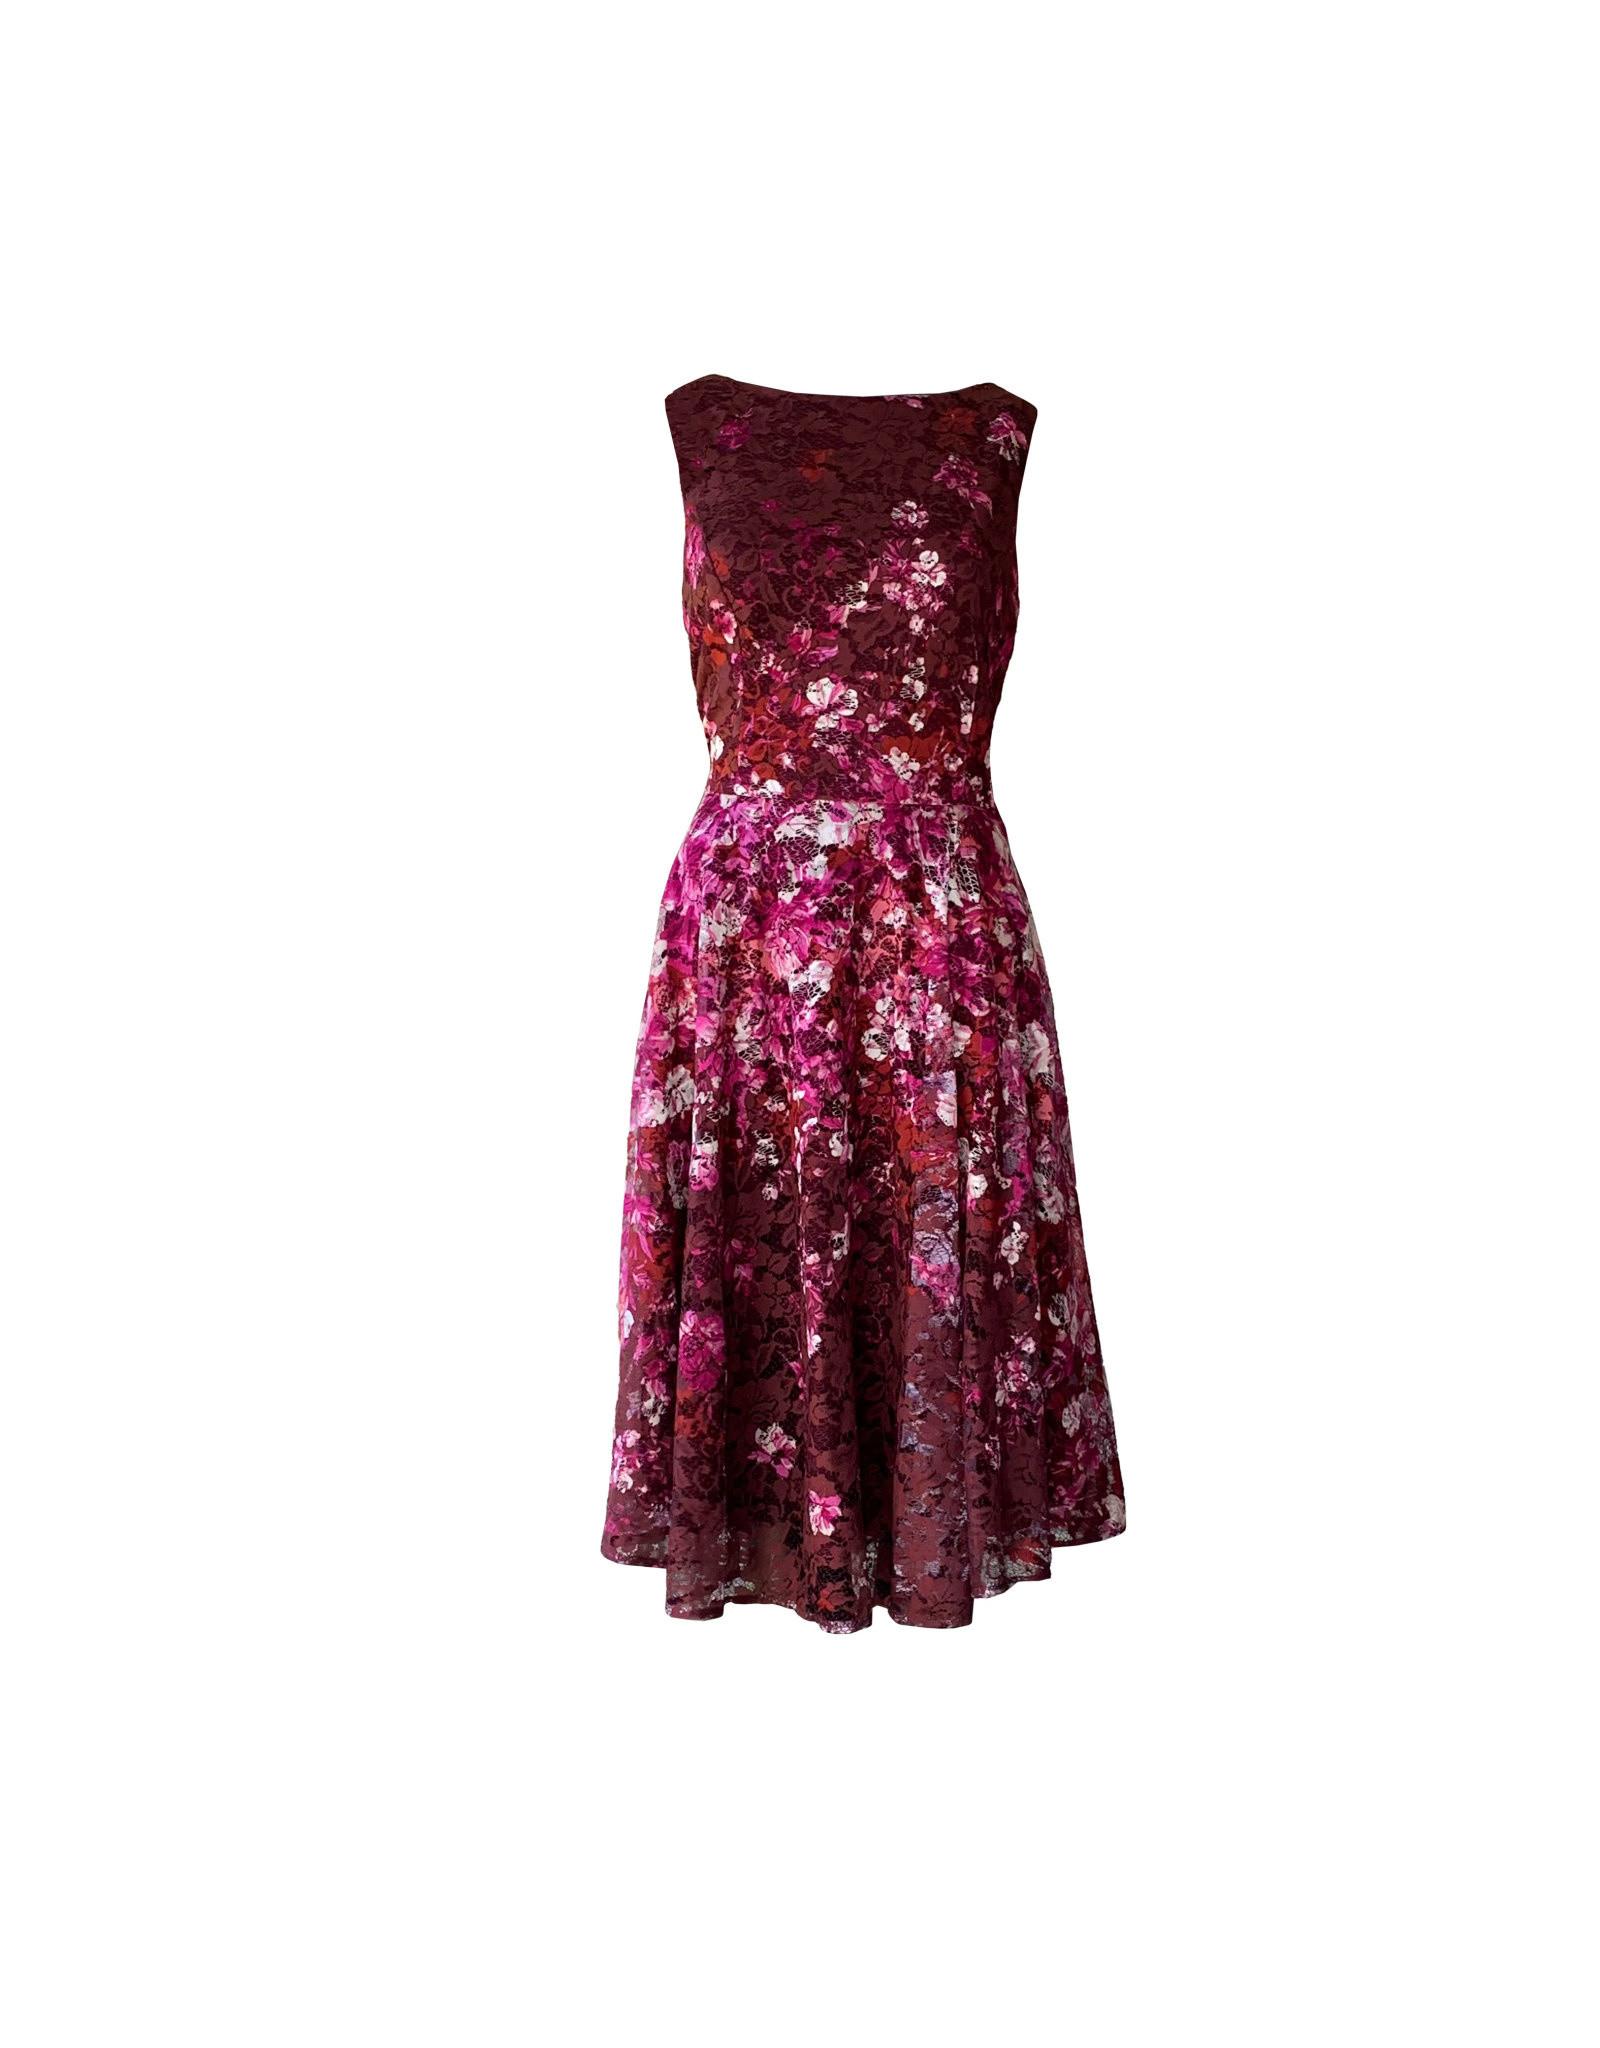 Gabby Skye Gabby  skye floral lace dresses size 10